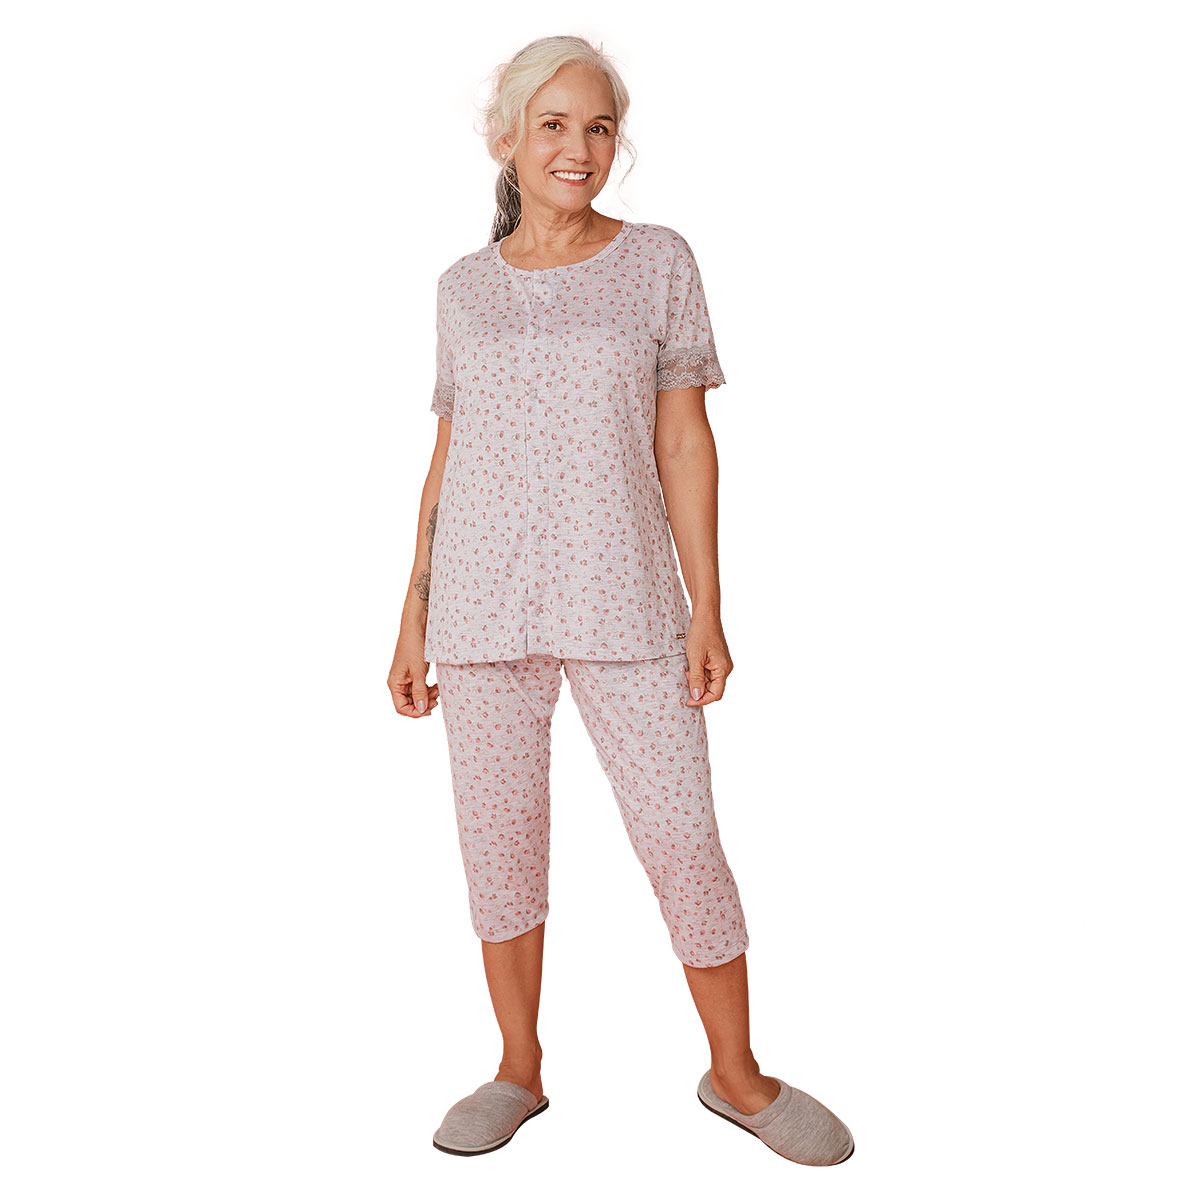 Pijama Feminino Aberto Mardelle